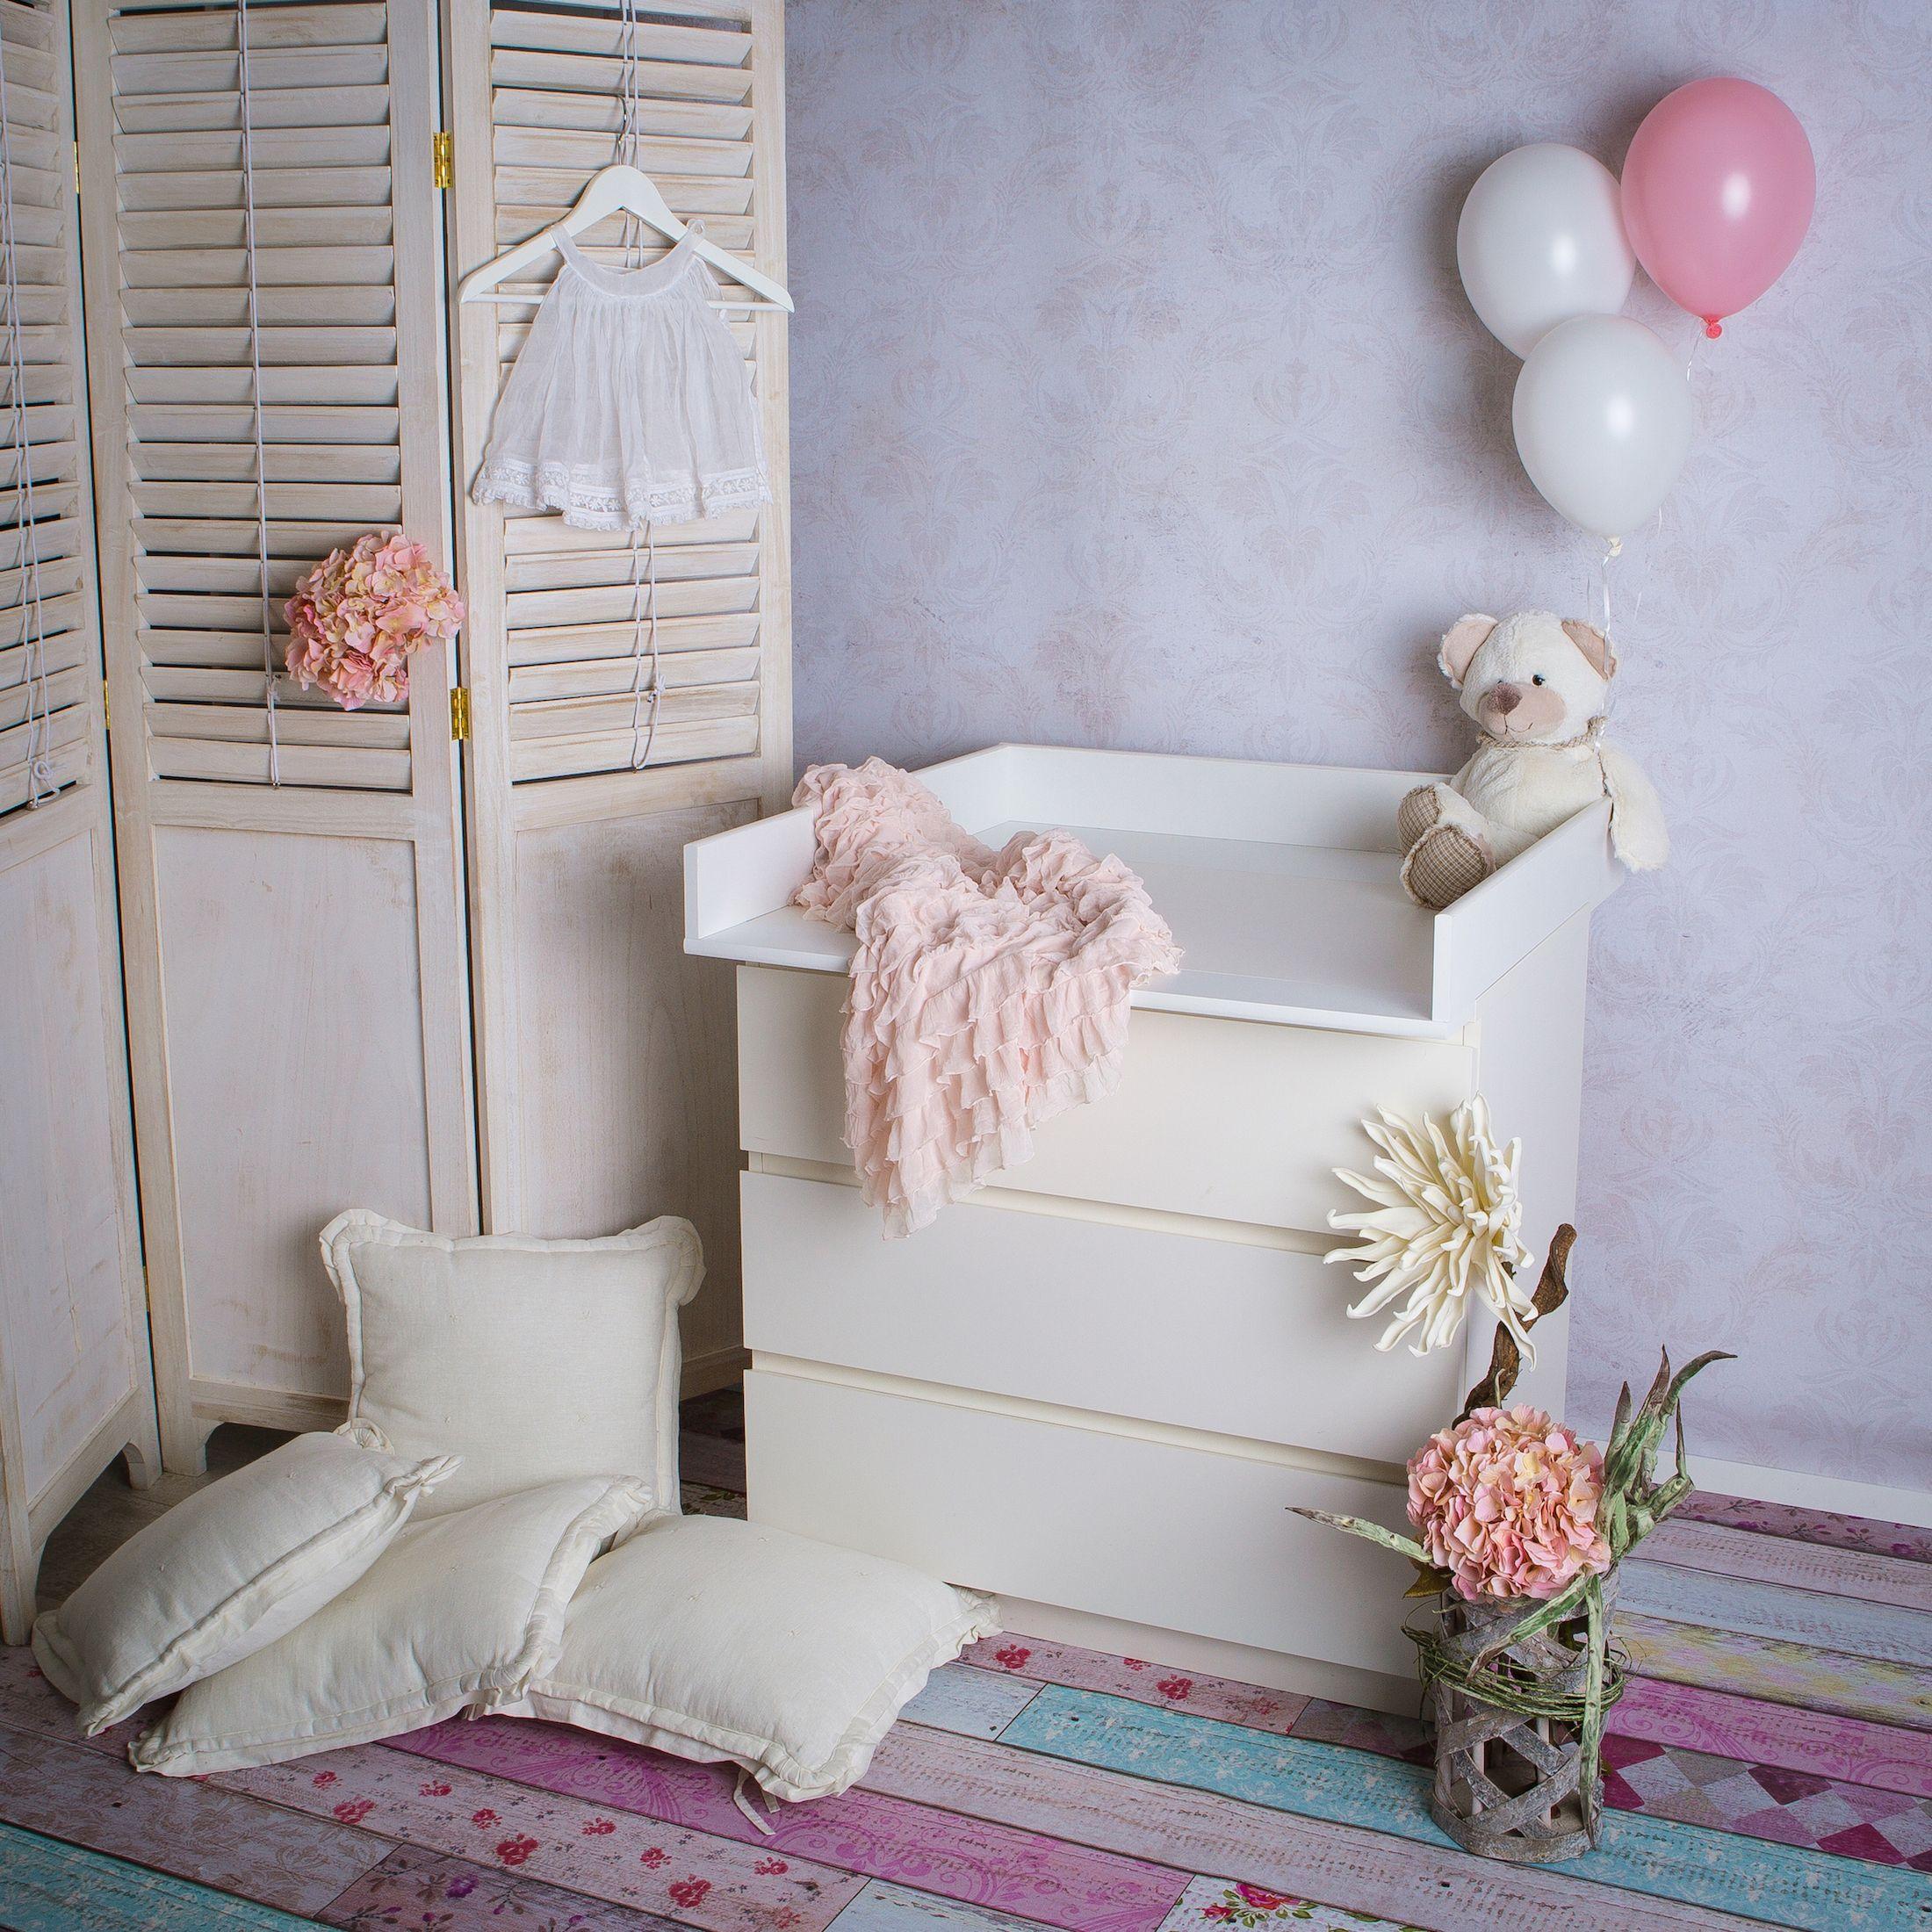 Baby kommode ebay kreative ideen f r innendekoration und for Kommode ikea malm